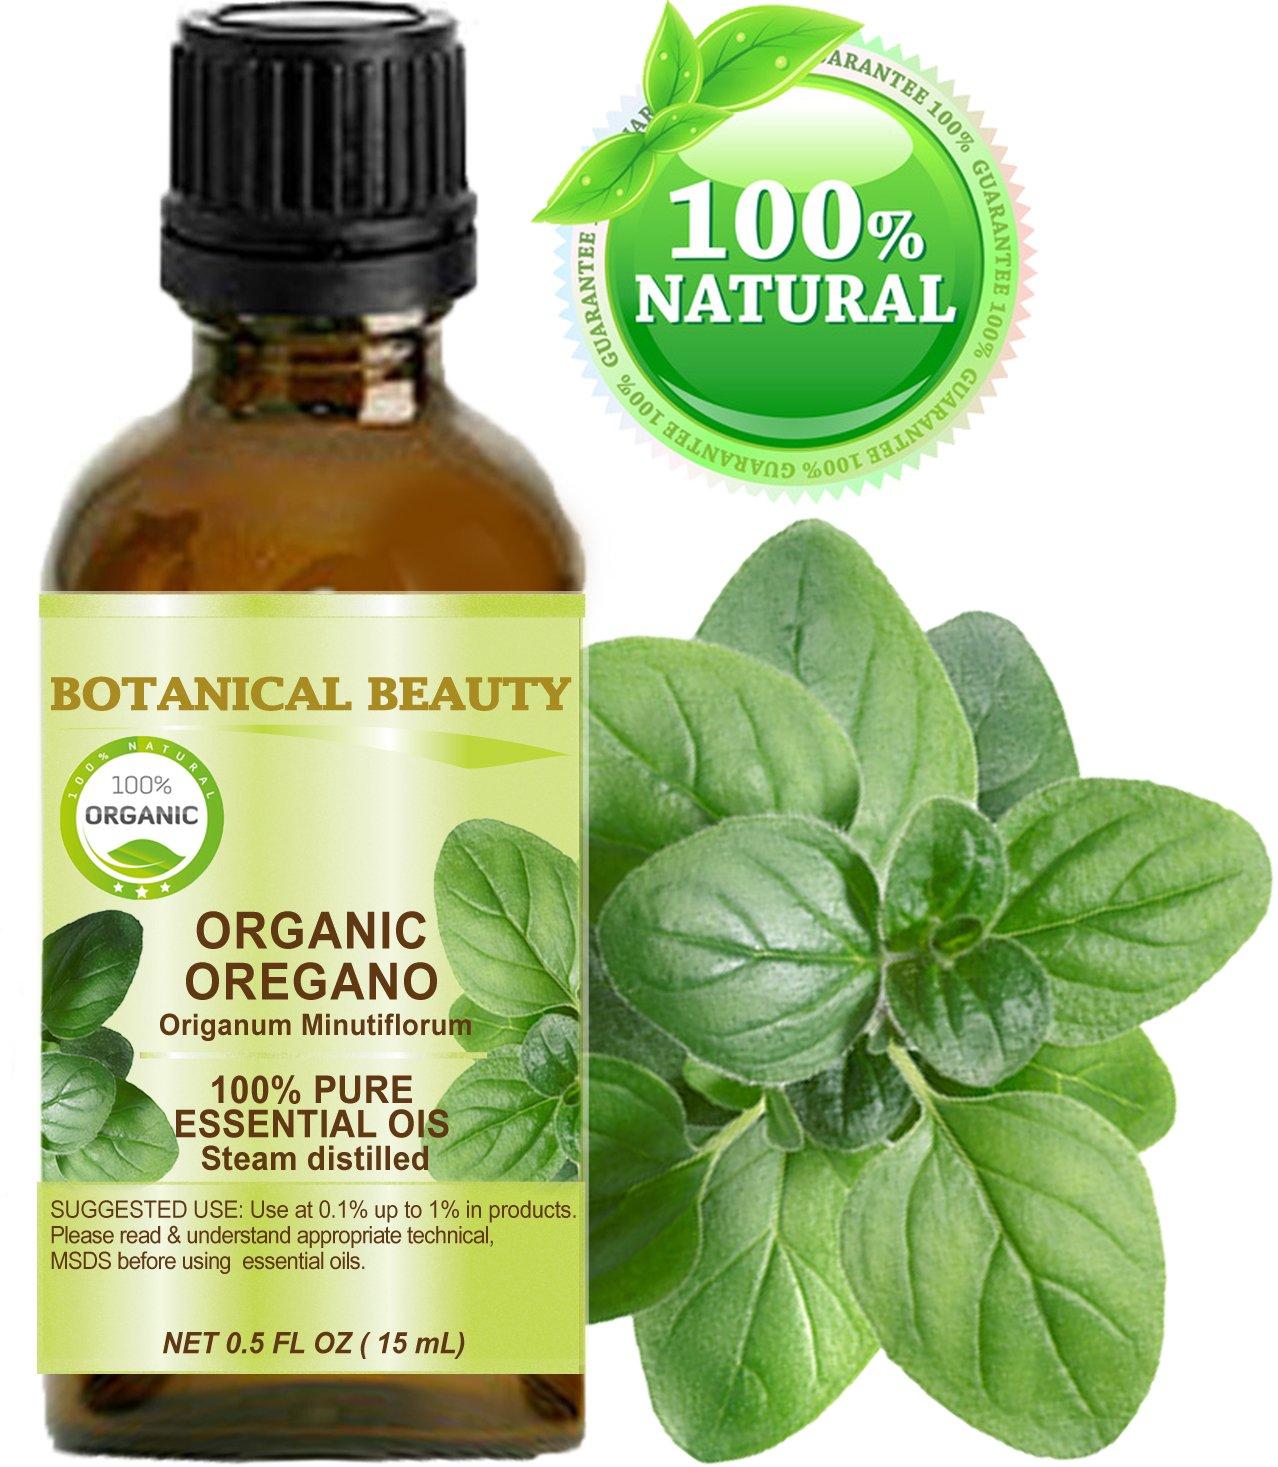 ORGANIC OREGANO ESSENTIAL OIL WILD GROWTH. 100% Pure Therapeutic Grade, Premium Quality, Undiluted. (0.5 Fl.oz - 15 ml.)